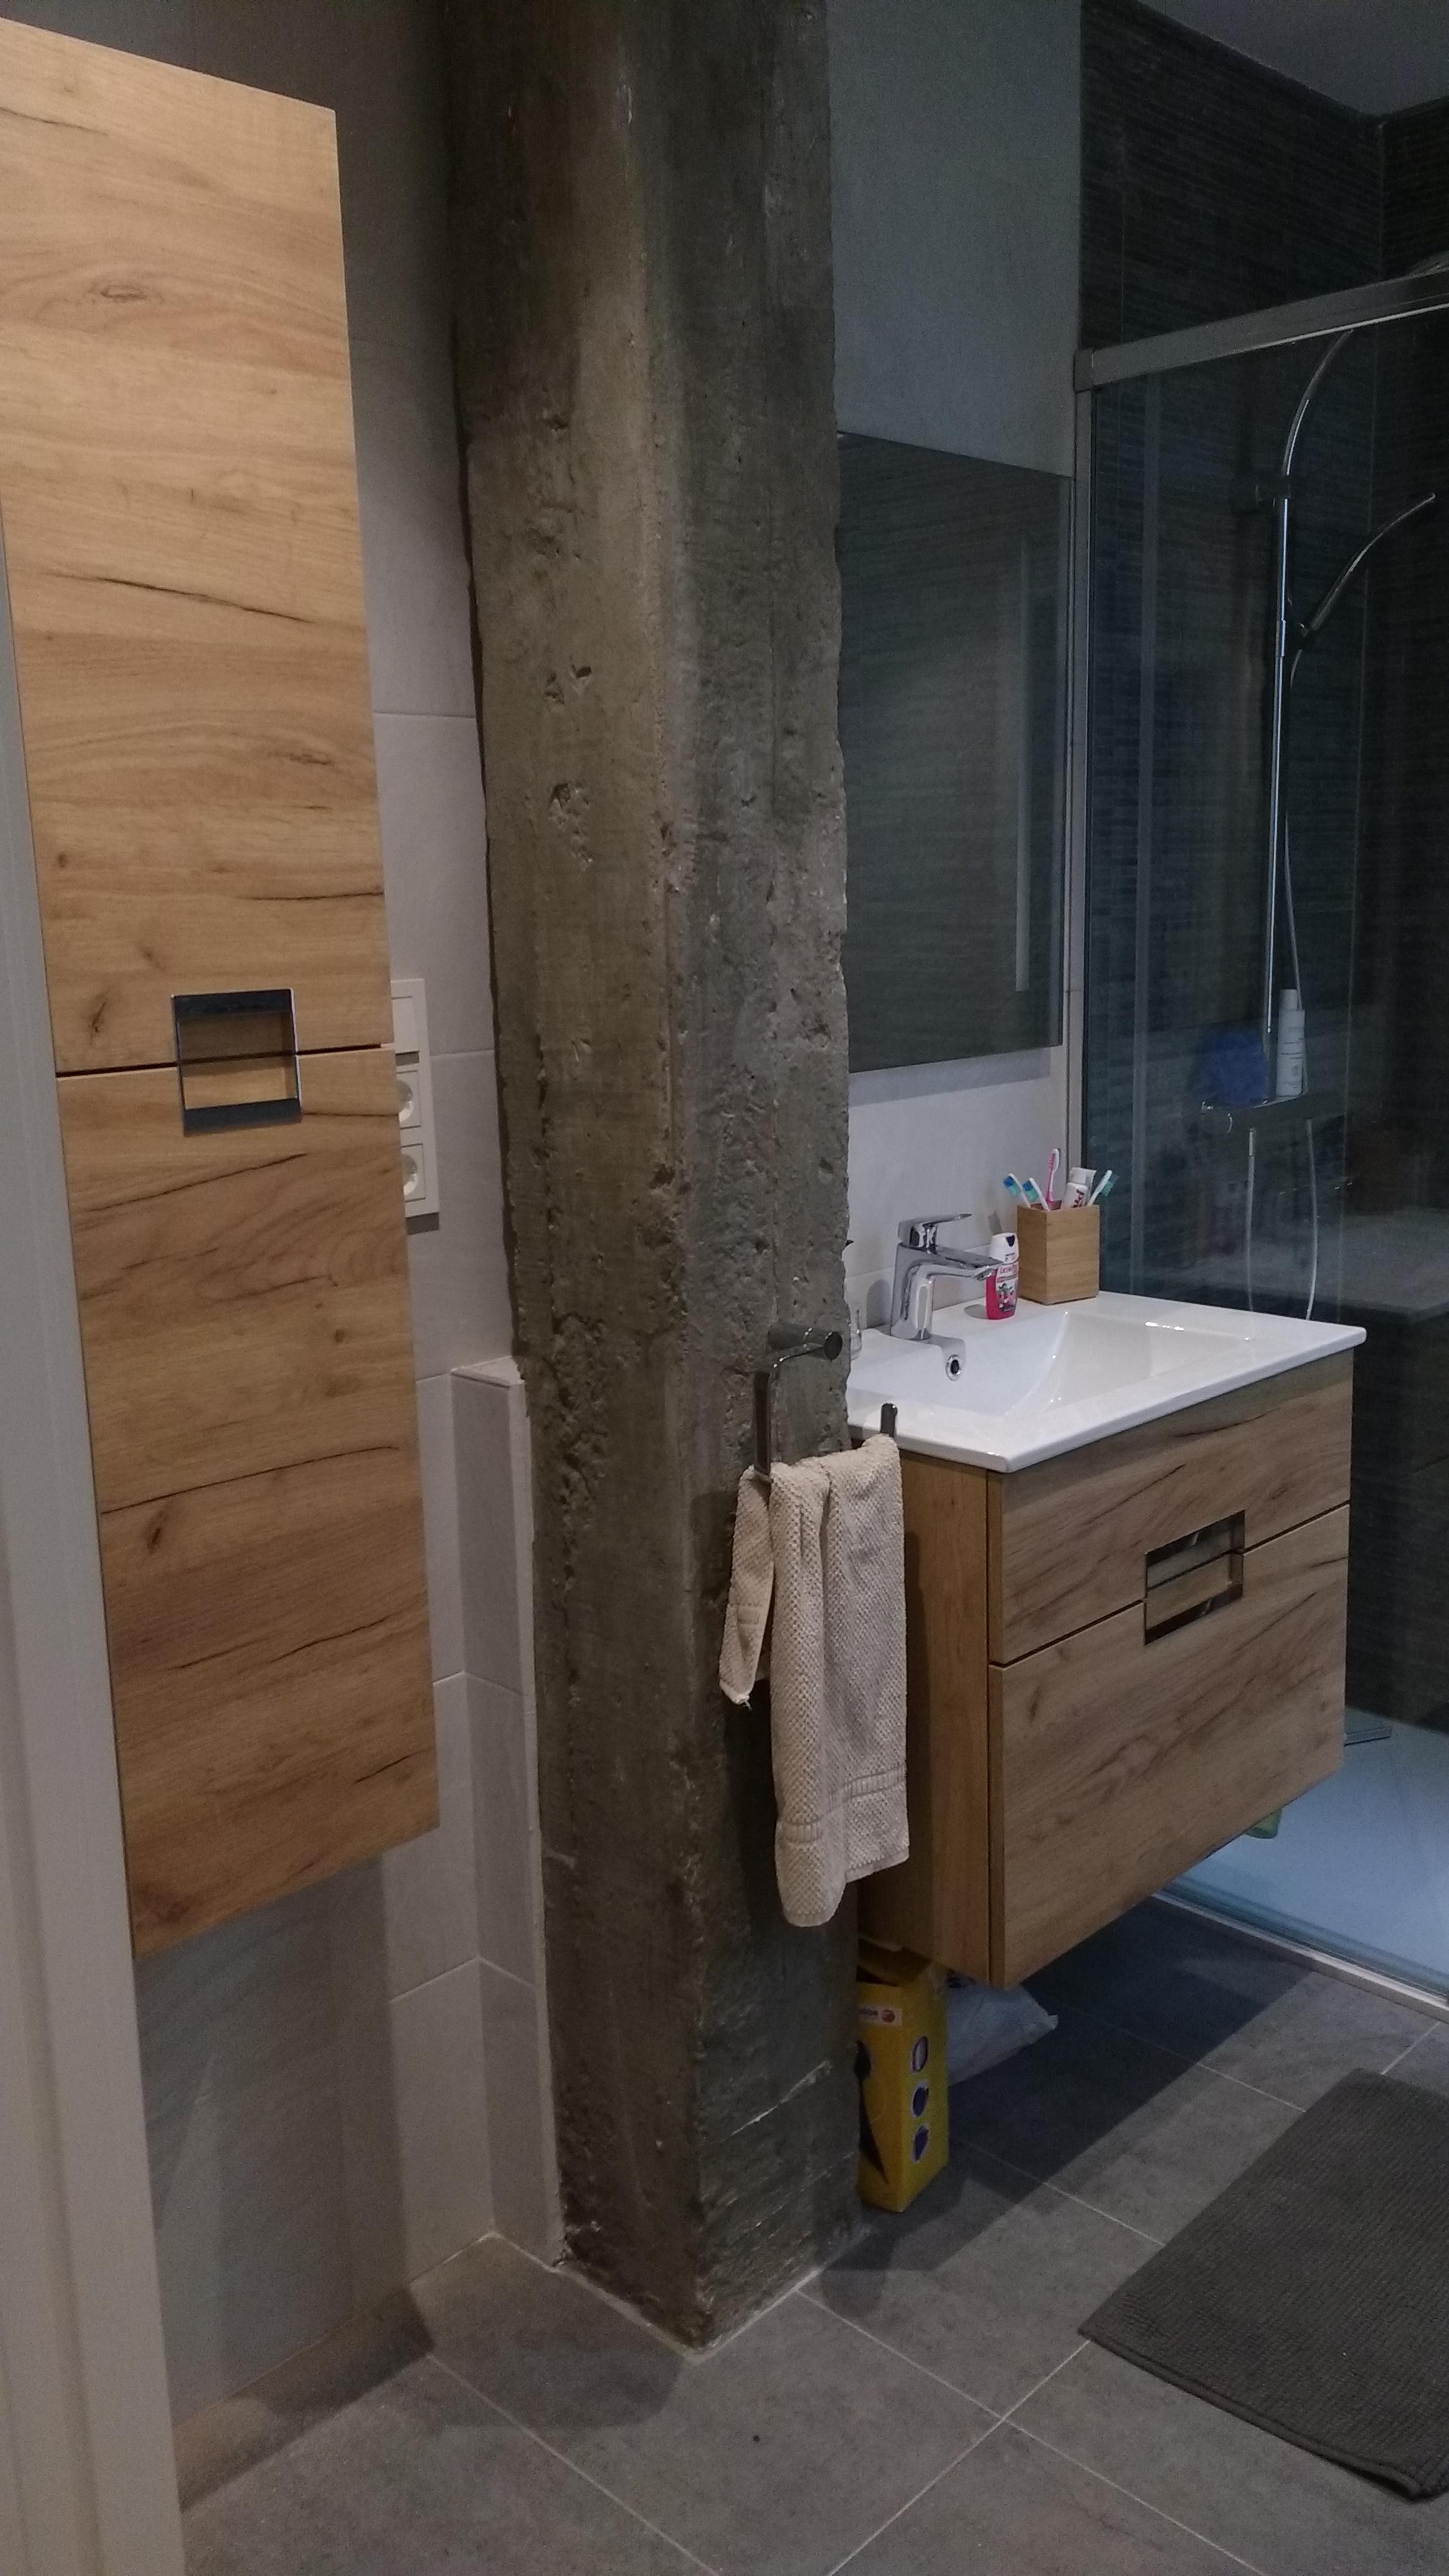 Reforma baño Trintxerpe-Donostia